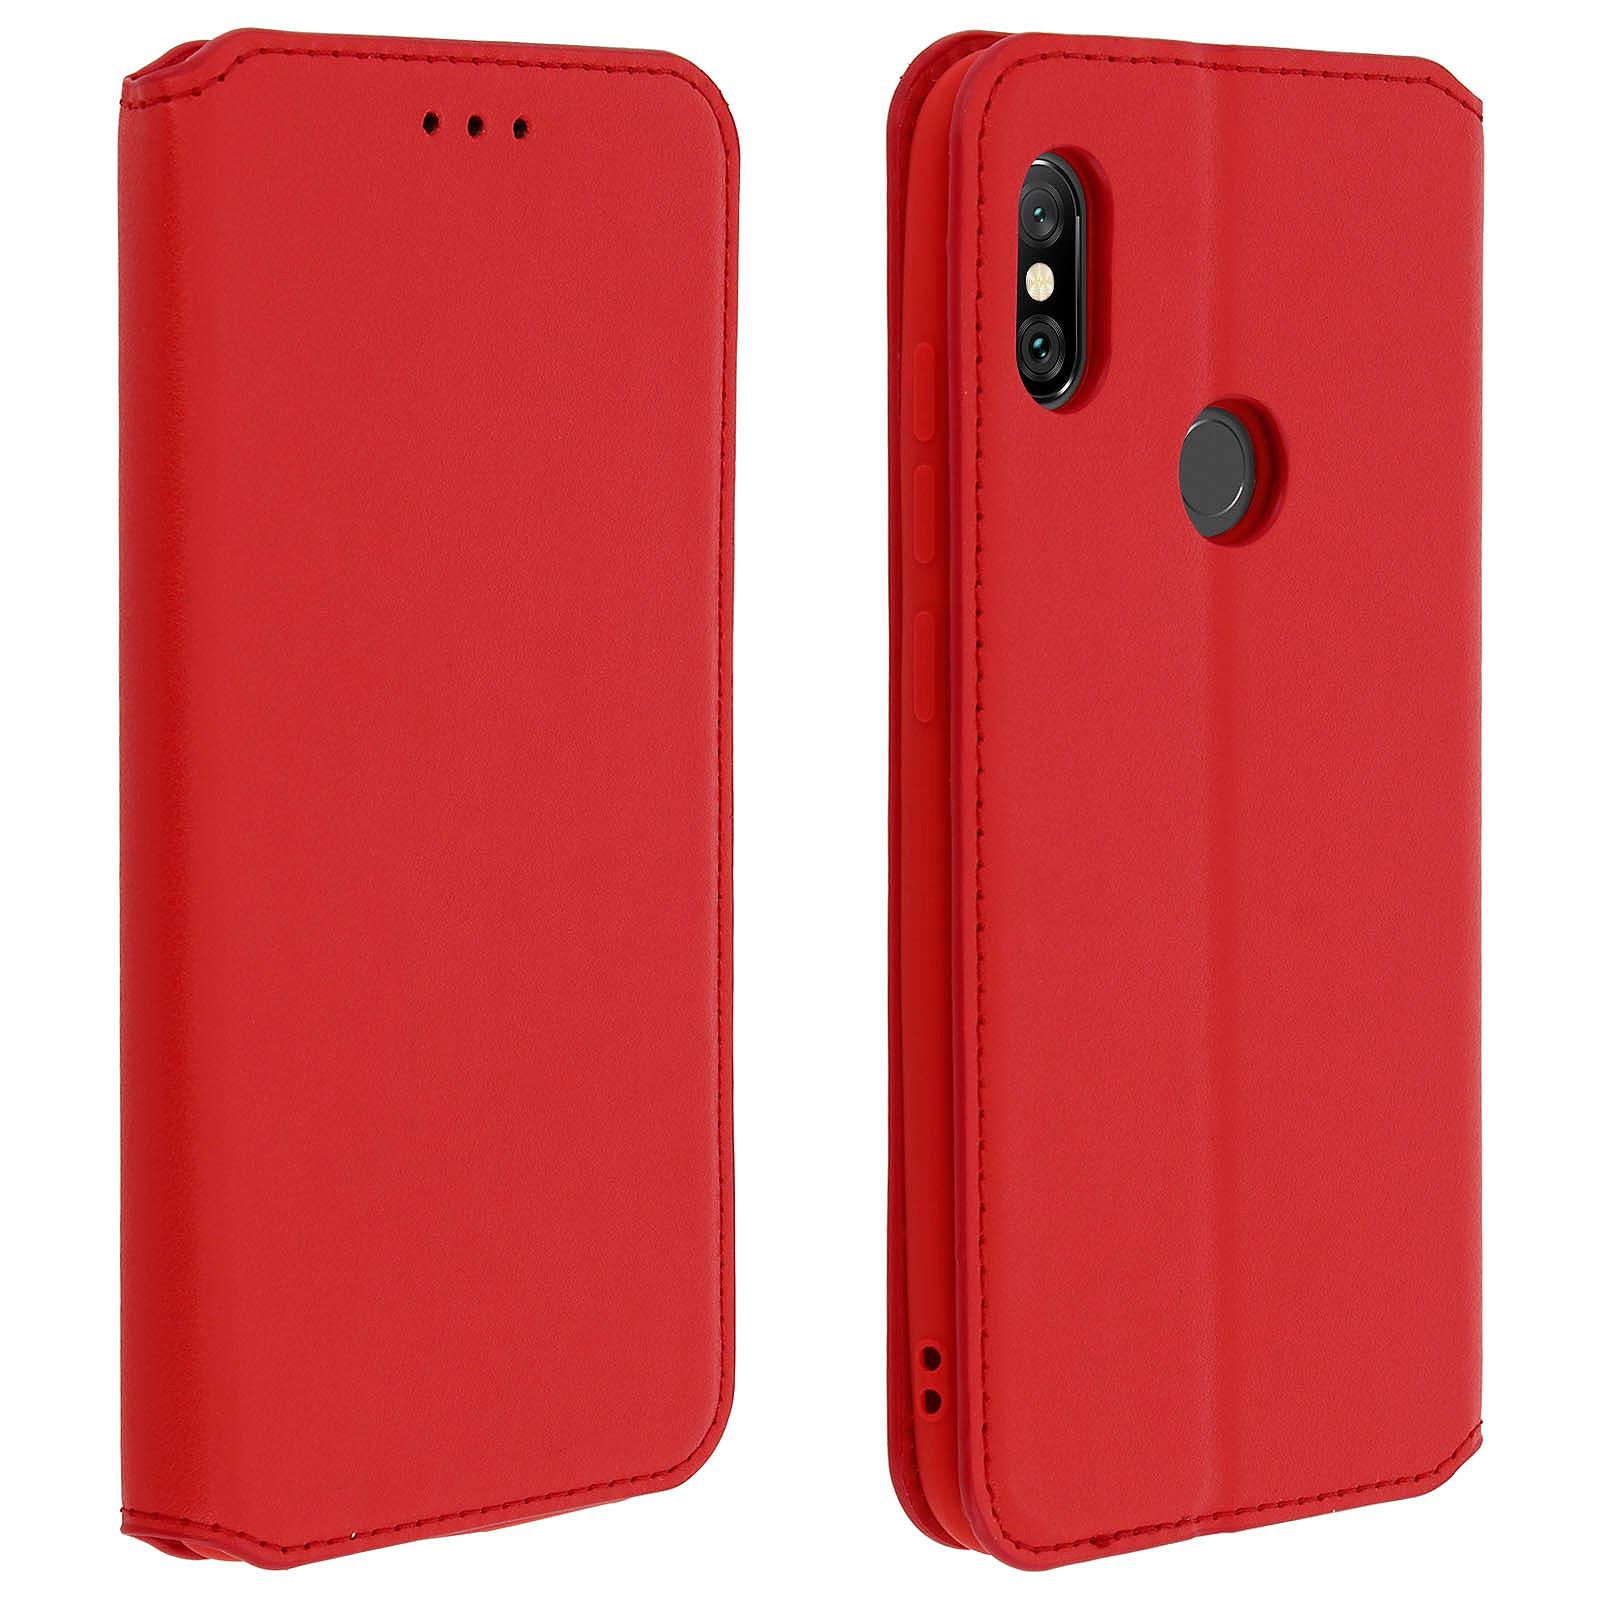 Avizar Etui folio Rouge pour Xiaomi Redmi Note 6 Pro